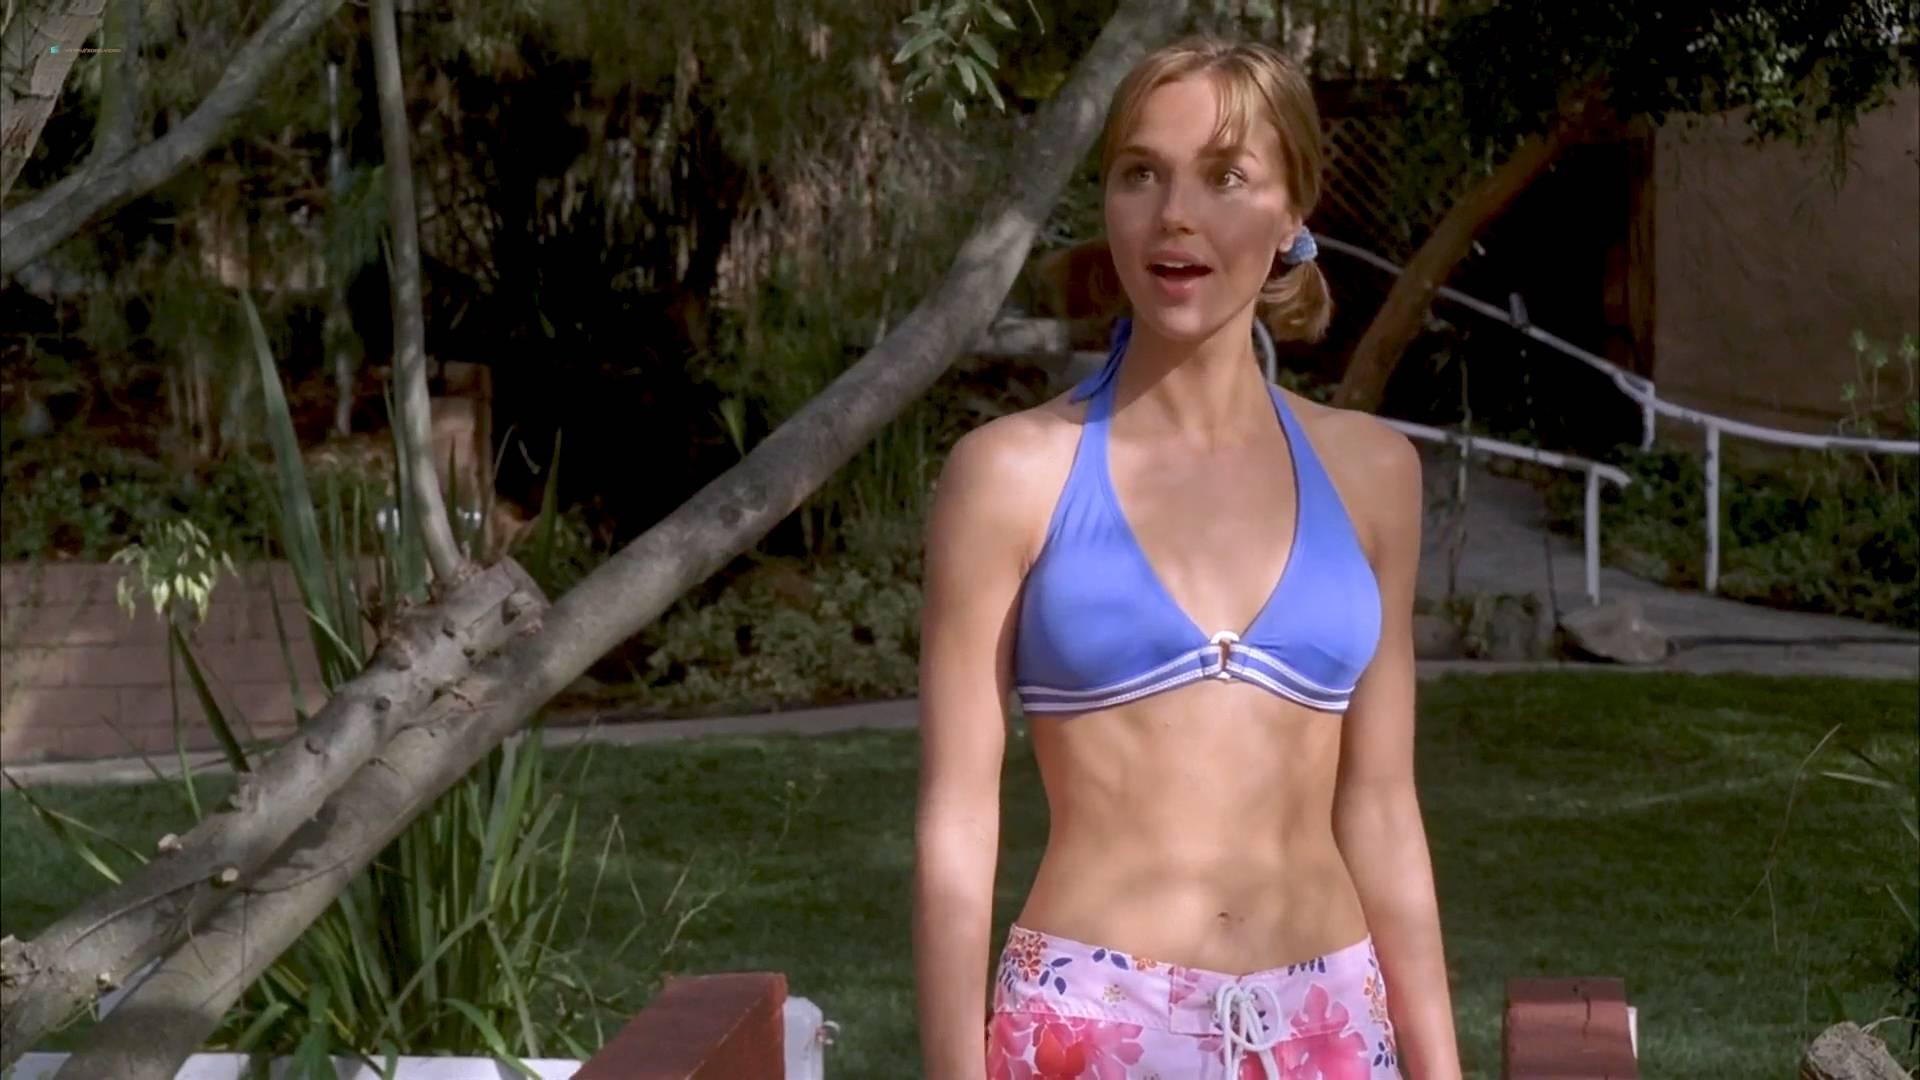 Arielle Kebbel hot, Tara Killian nude other's nude too - American Pie Presents Band Camp (2005) HD 1080p BluRay (10)